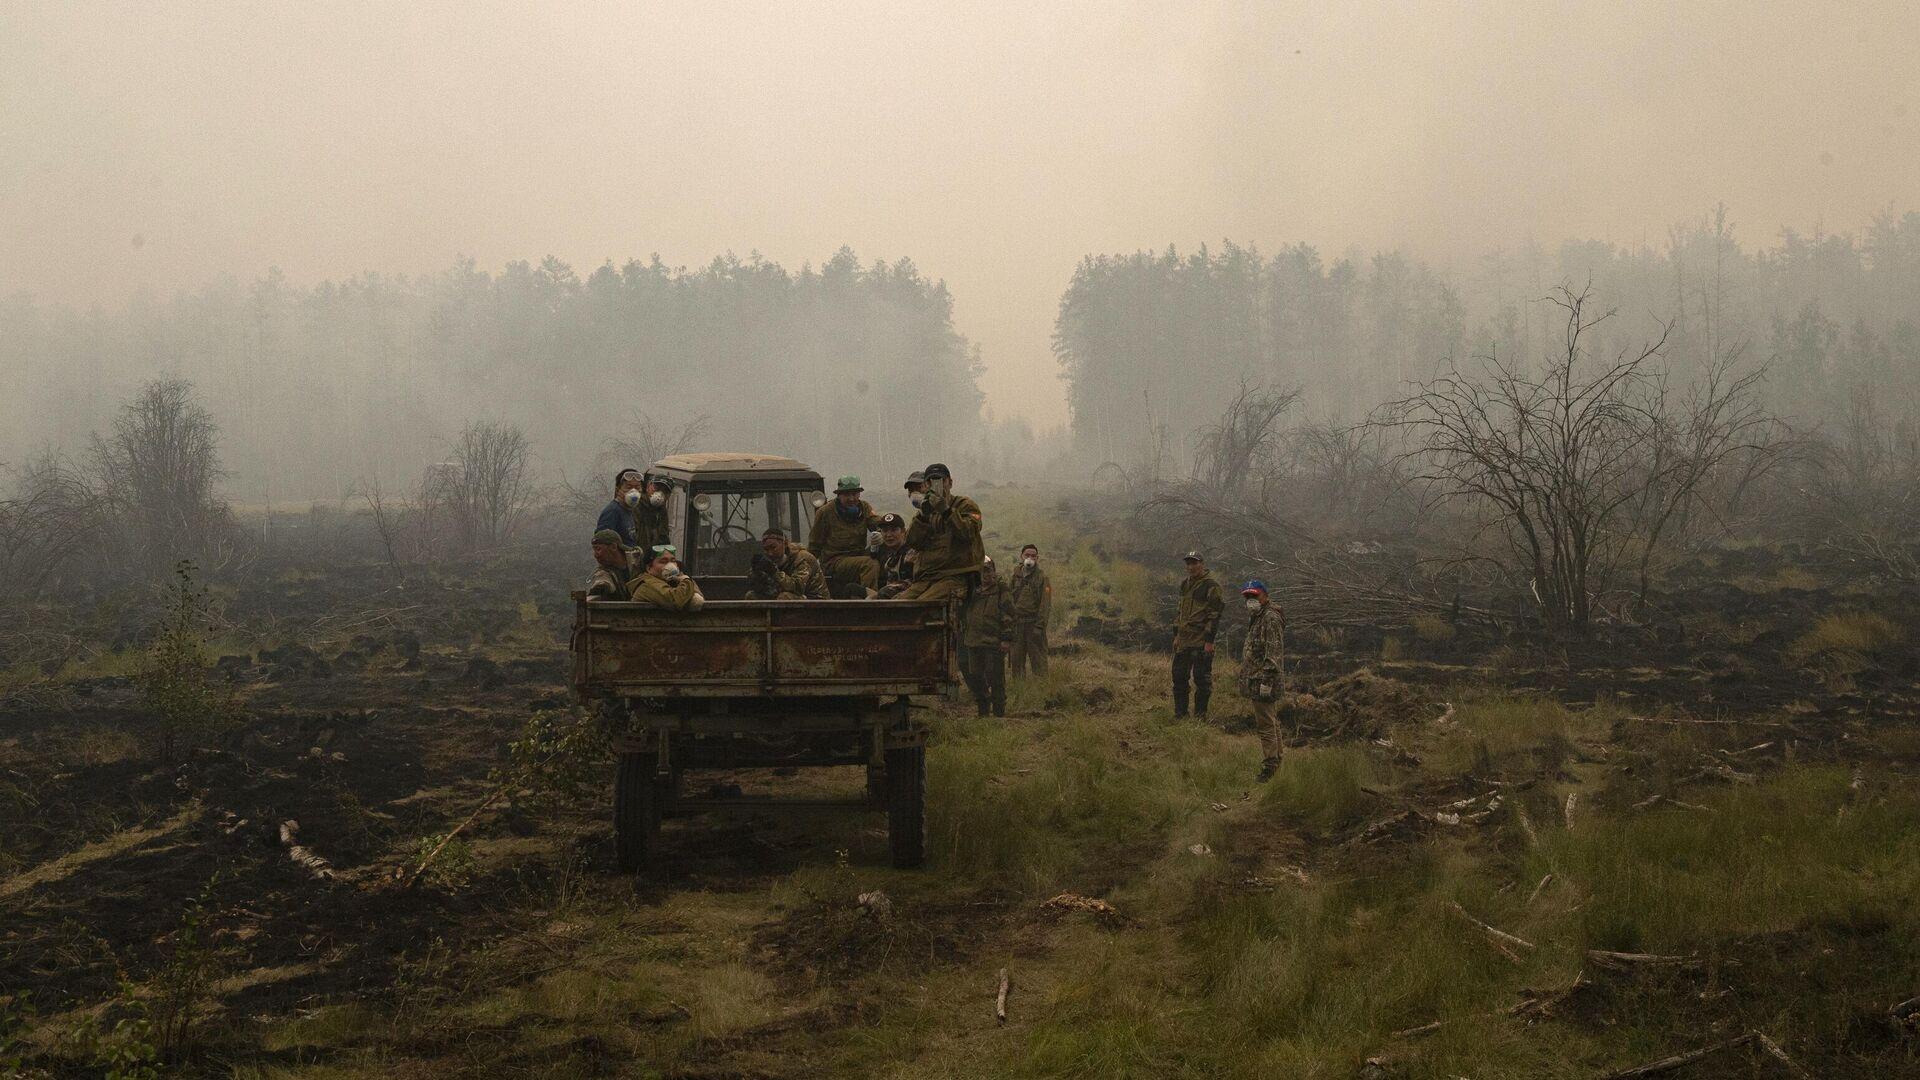 Incendios forestales en Rusia - Sputnik Mundo, 1920, 13.08.2021